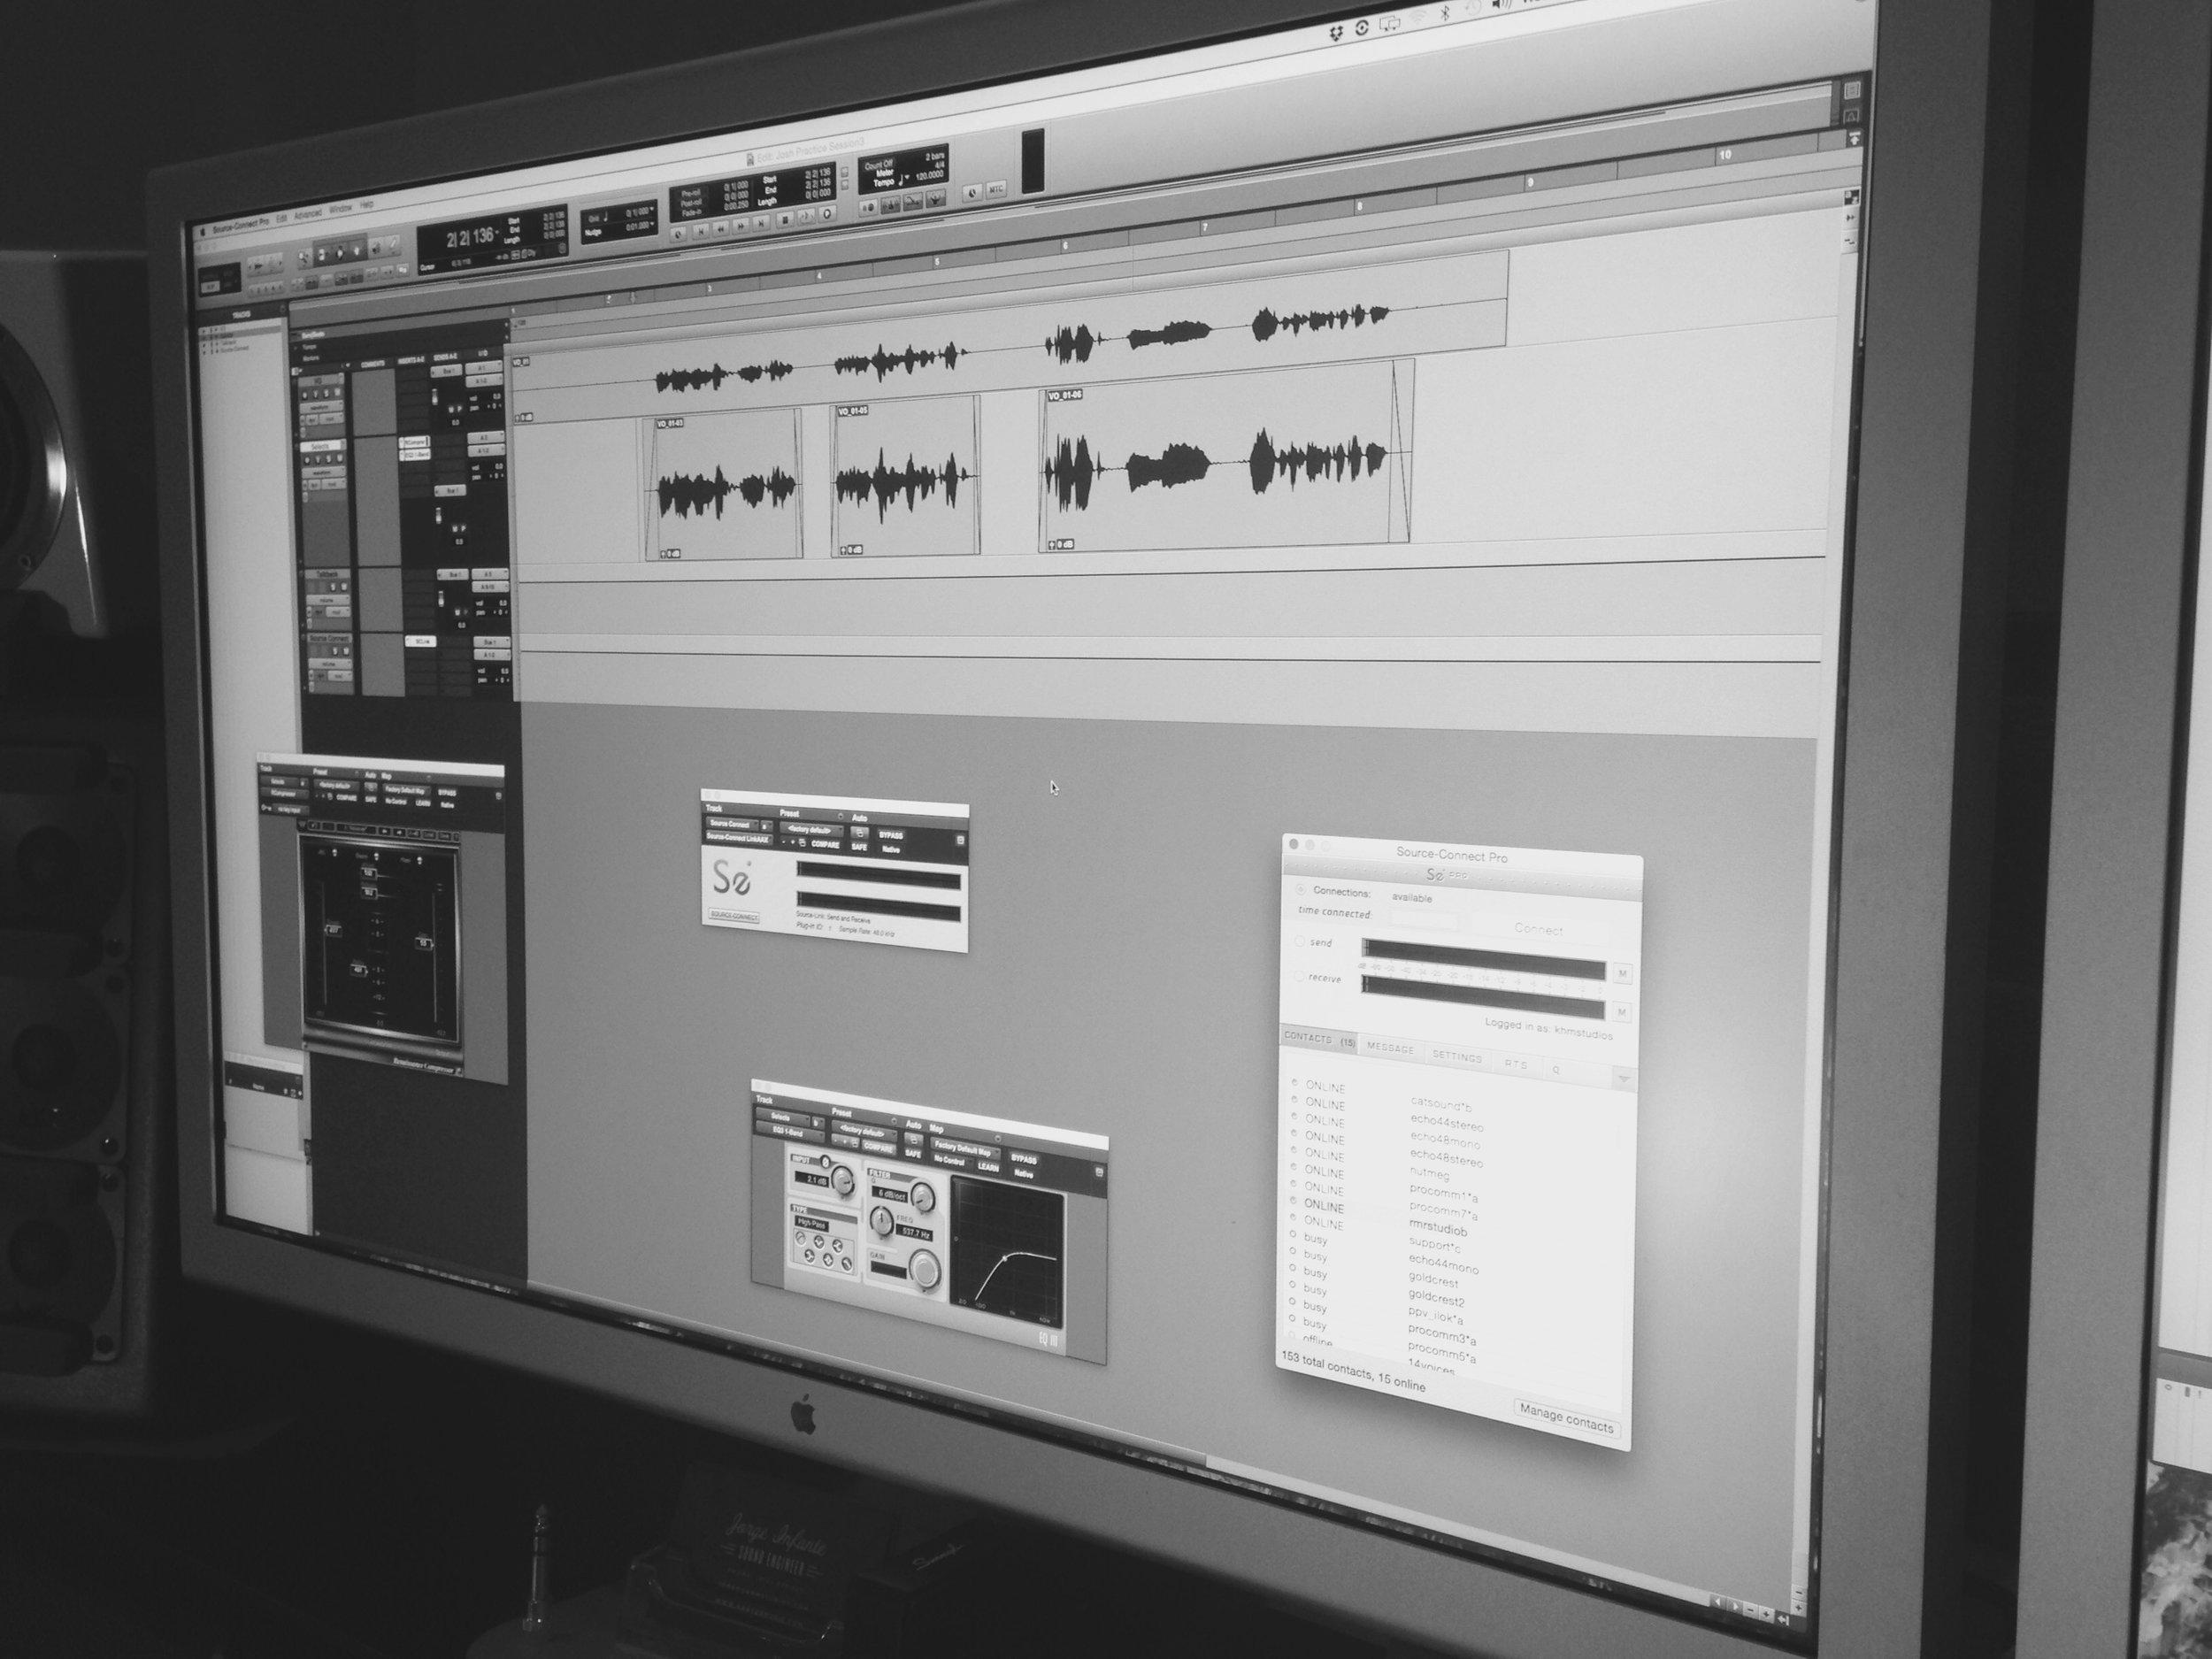 Source-Connect Pro - Username: khmstudios